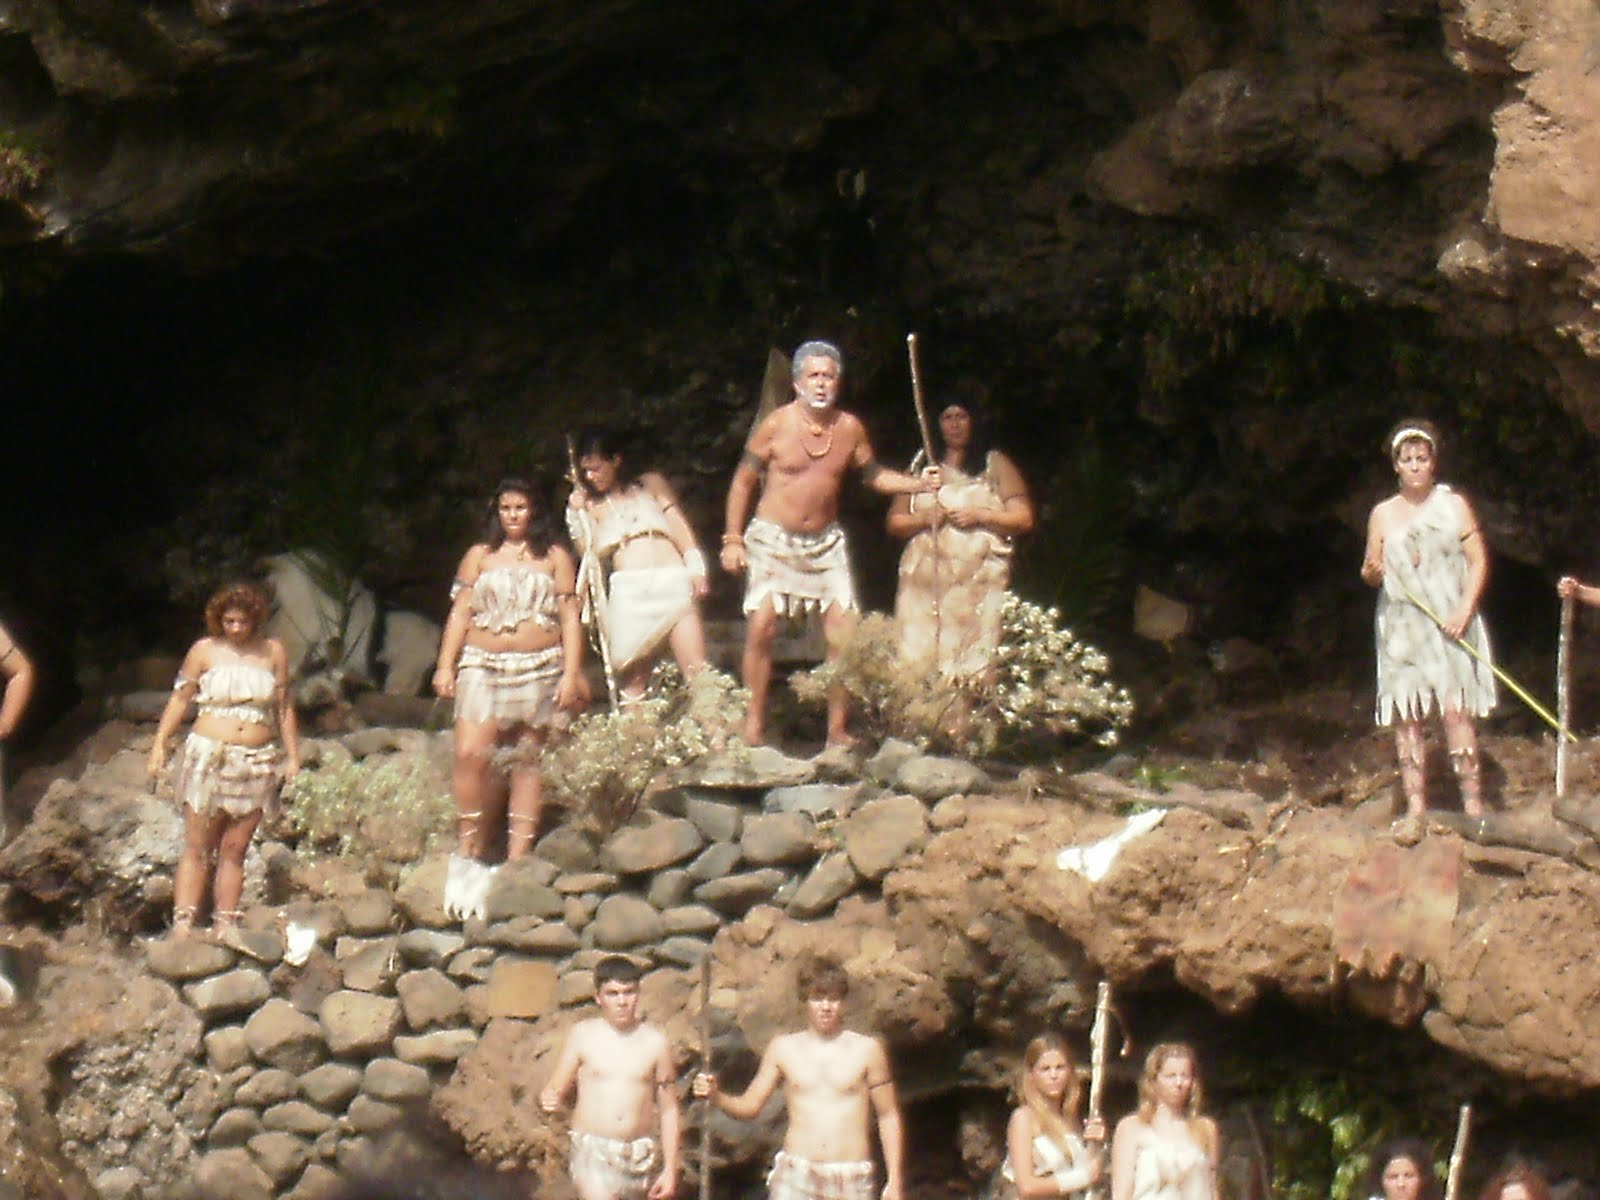 Fiestas l strales 2010 onom stica a la patrona de isla - Casas rurales la morenita ...